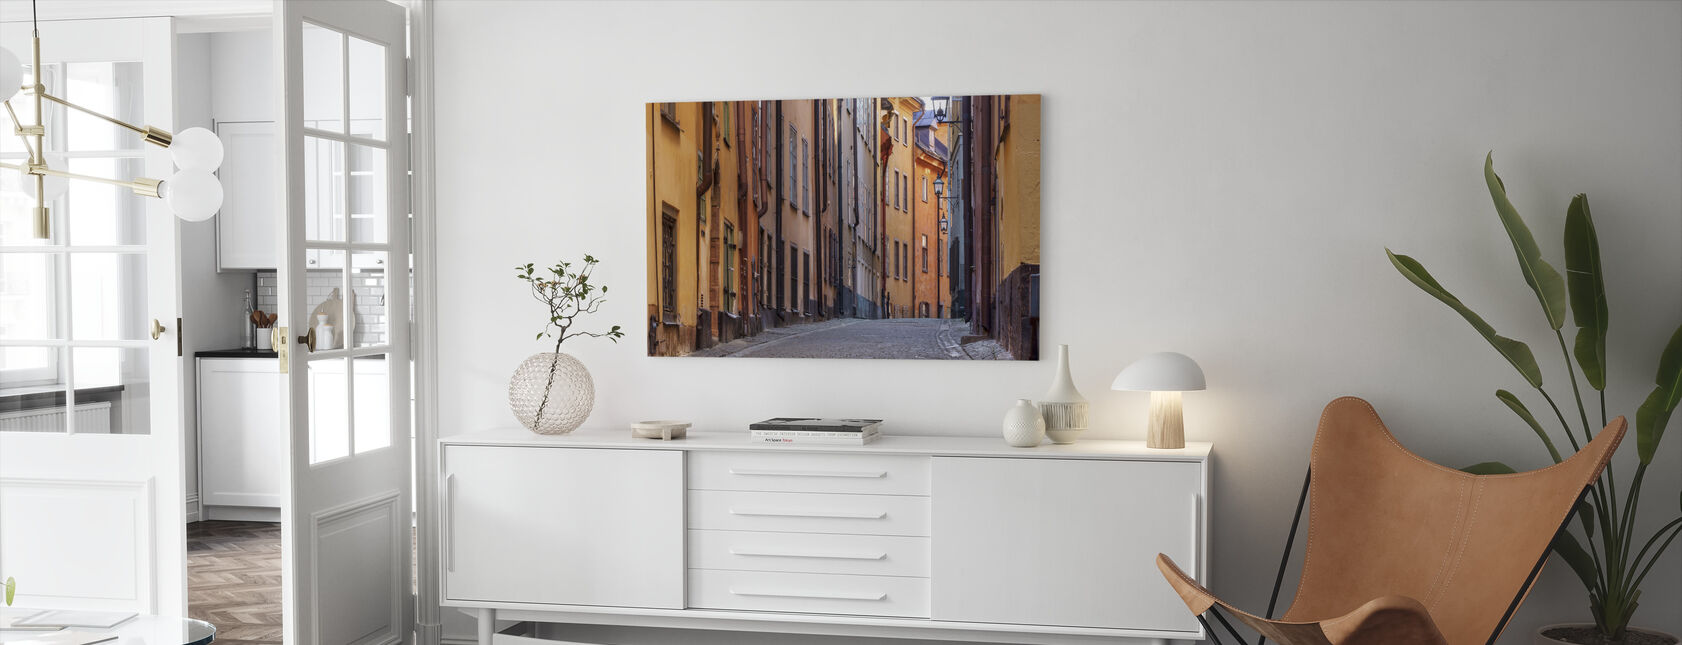 Straat in de oude binnenstad van Stockholm - Canvas print - Woonkamer